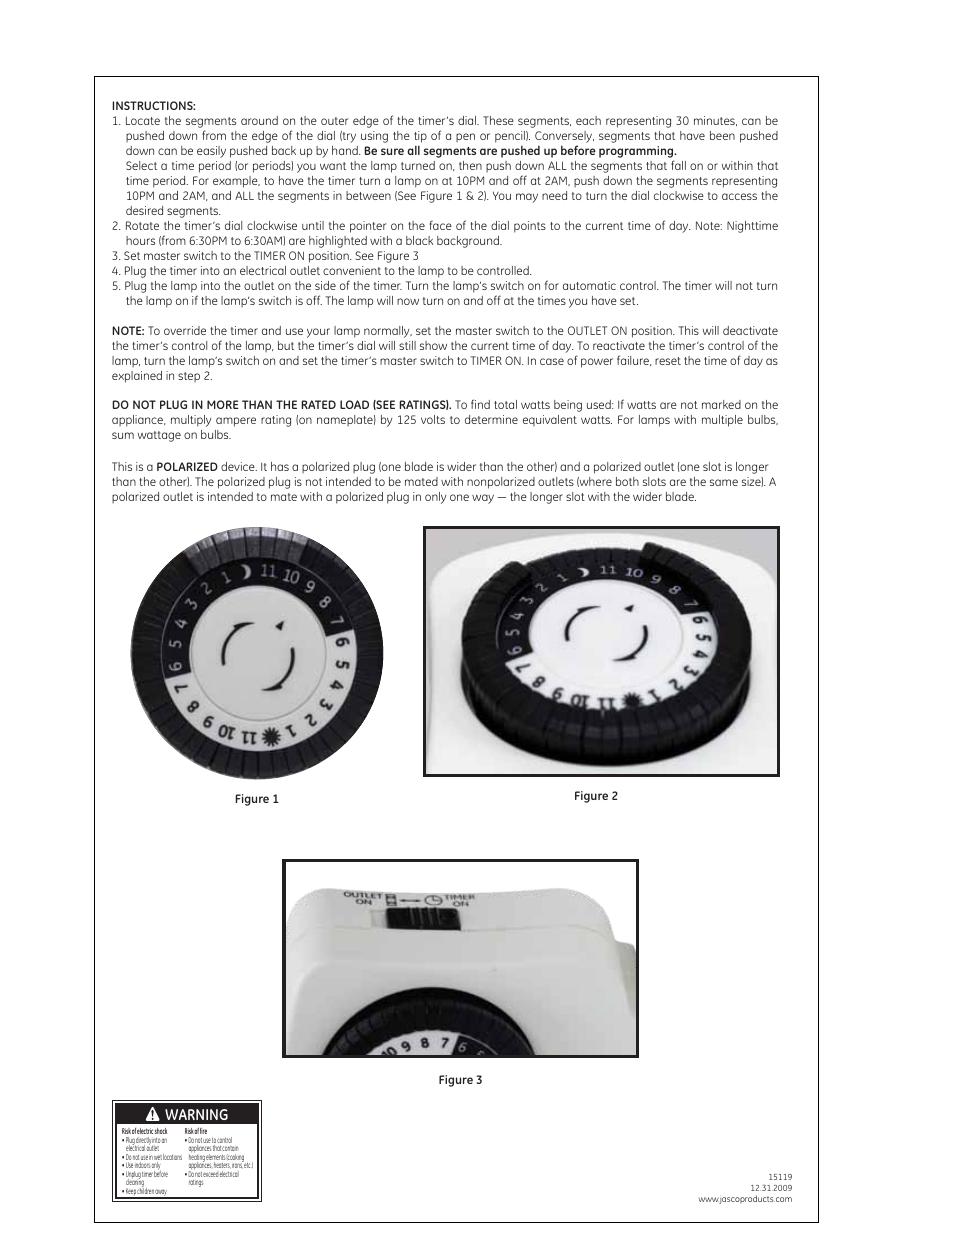 GE Plug-In 15119 15131 15417 24 hour Mechanical Timer User Manual ...